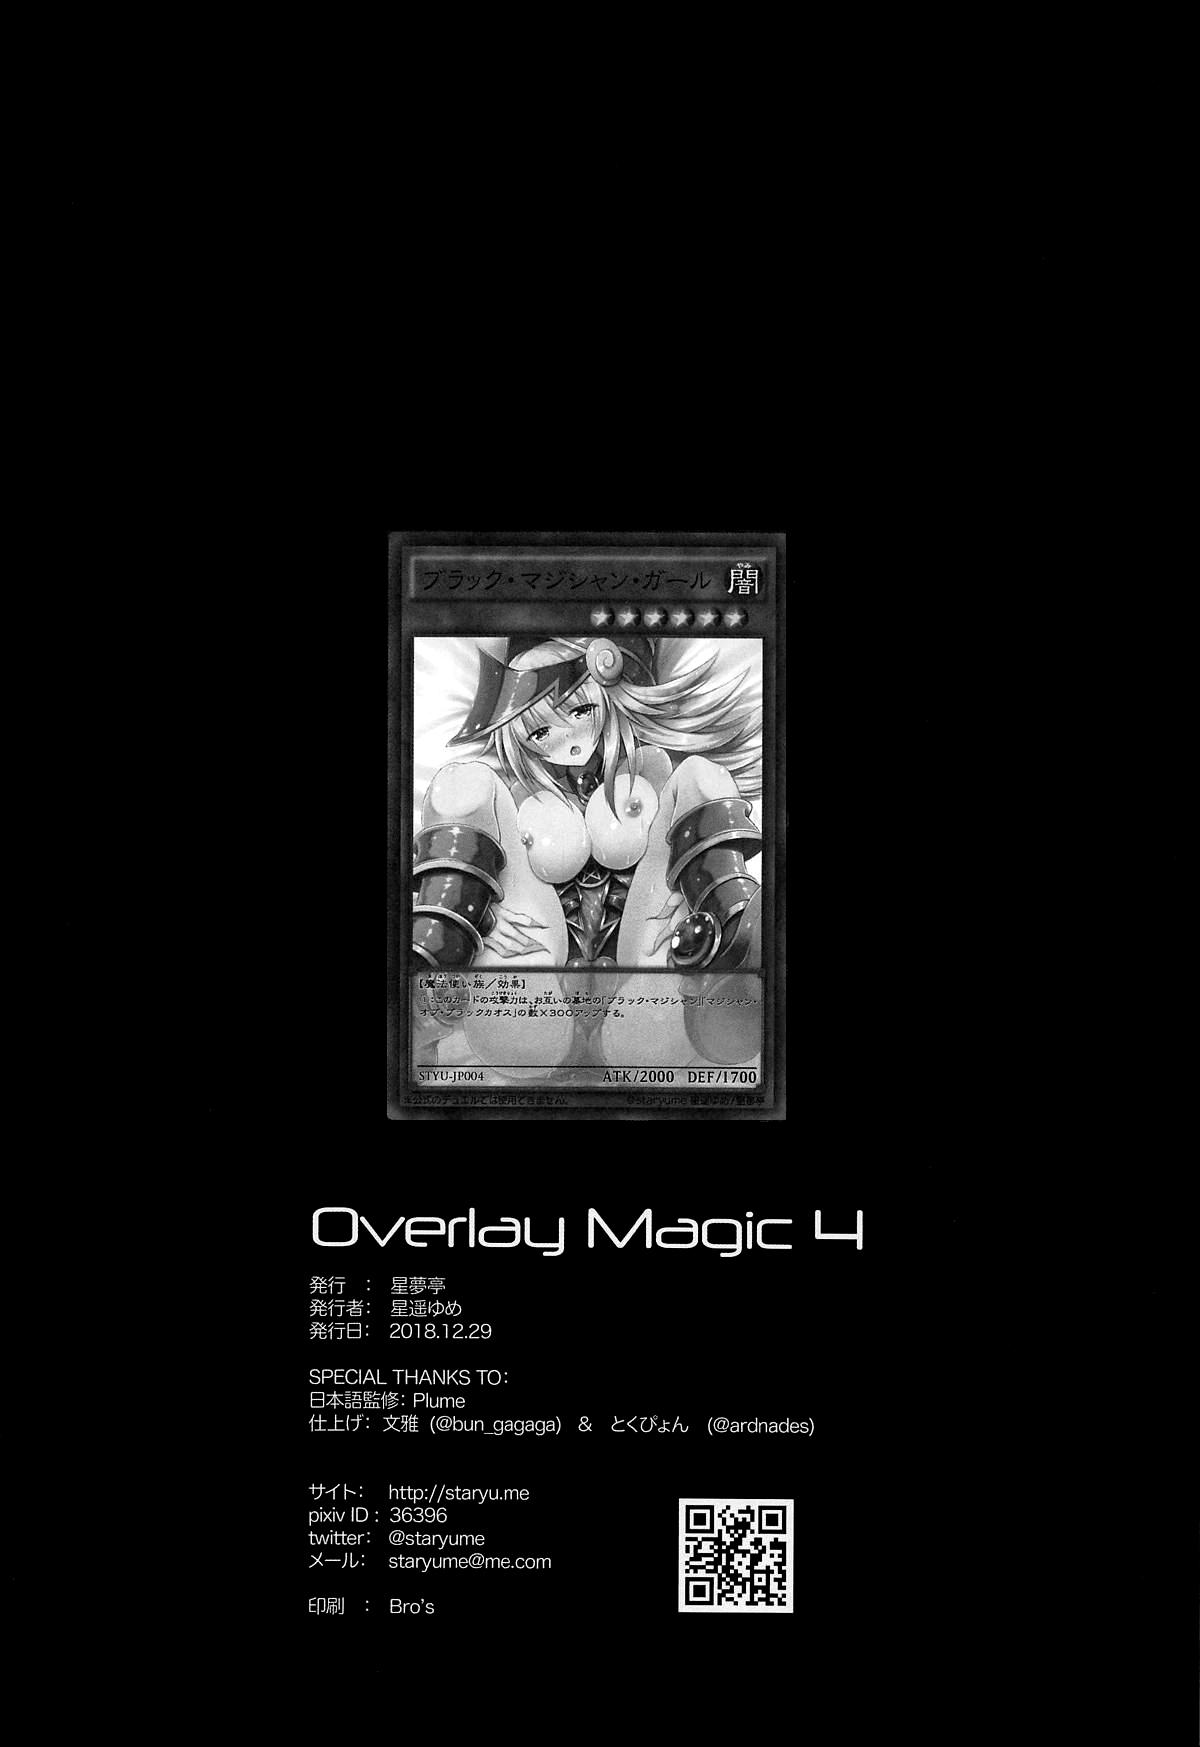 Overlay Magic 4 21